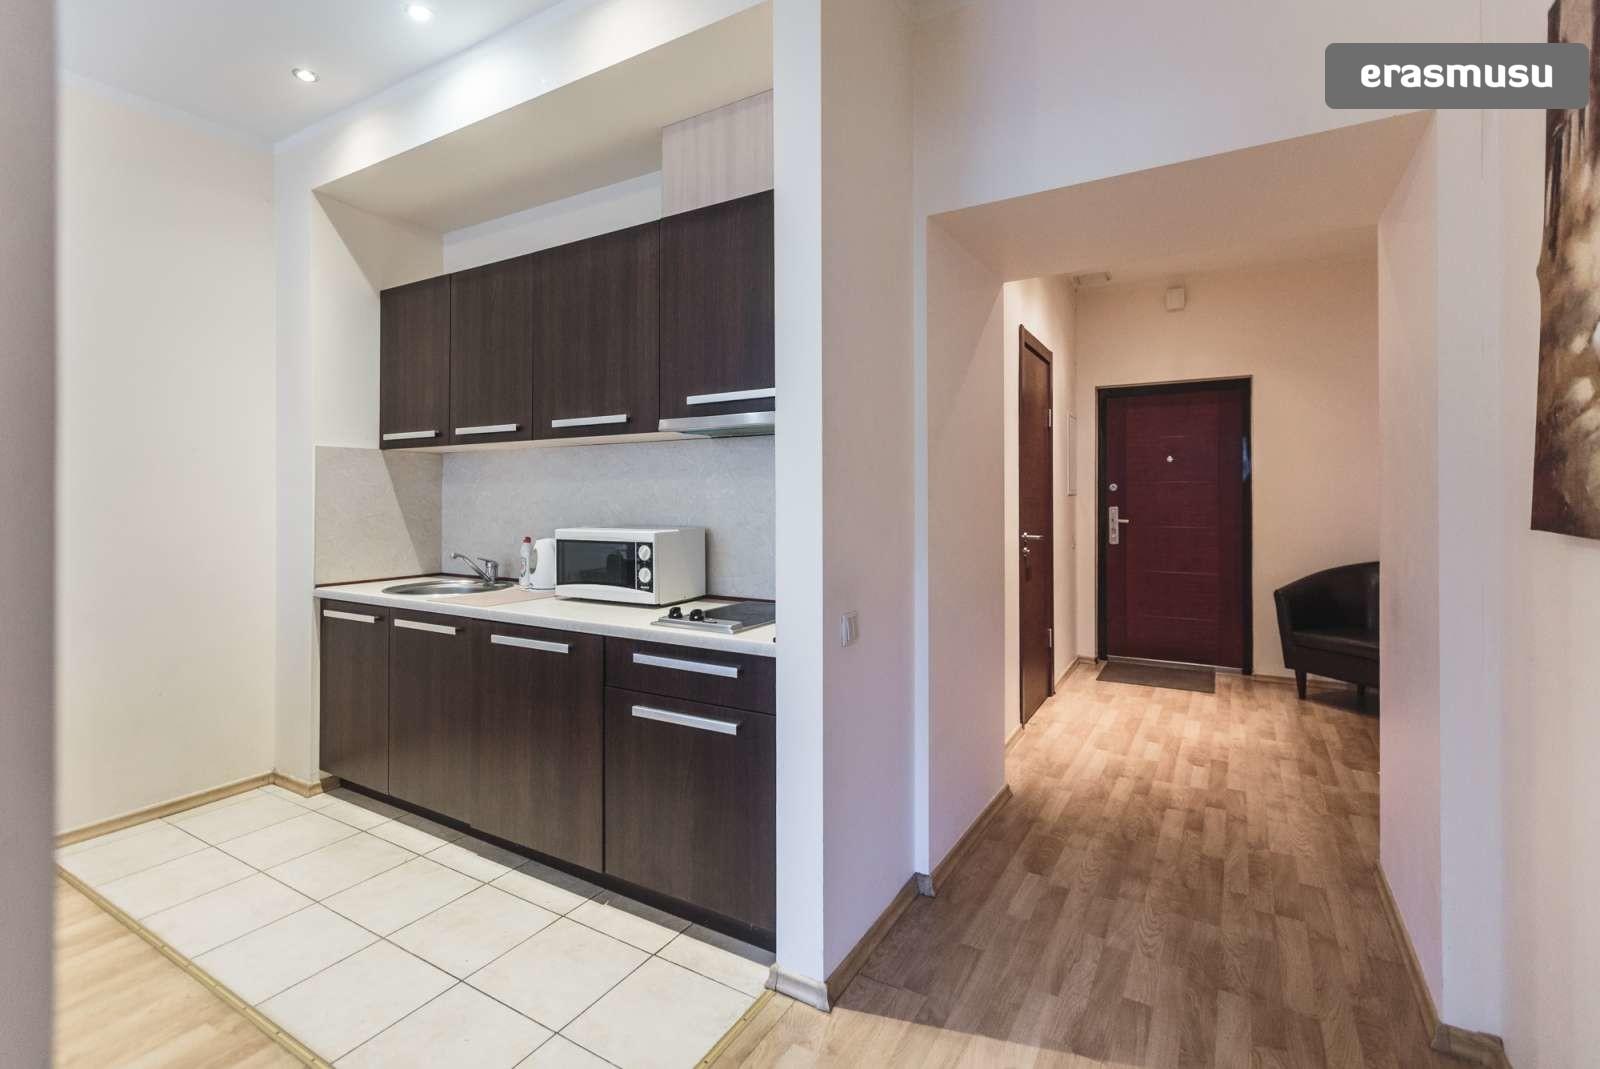 1-bedroom-apartment-rent-maskavas-forstate-a57482da75e4a7a7488d5